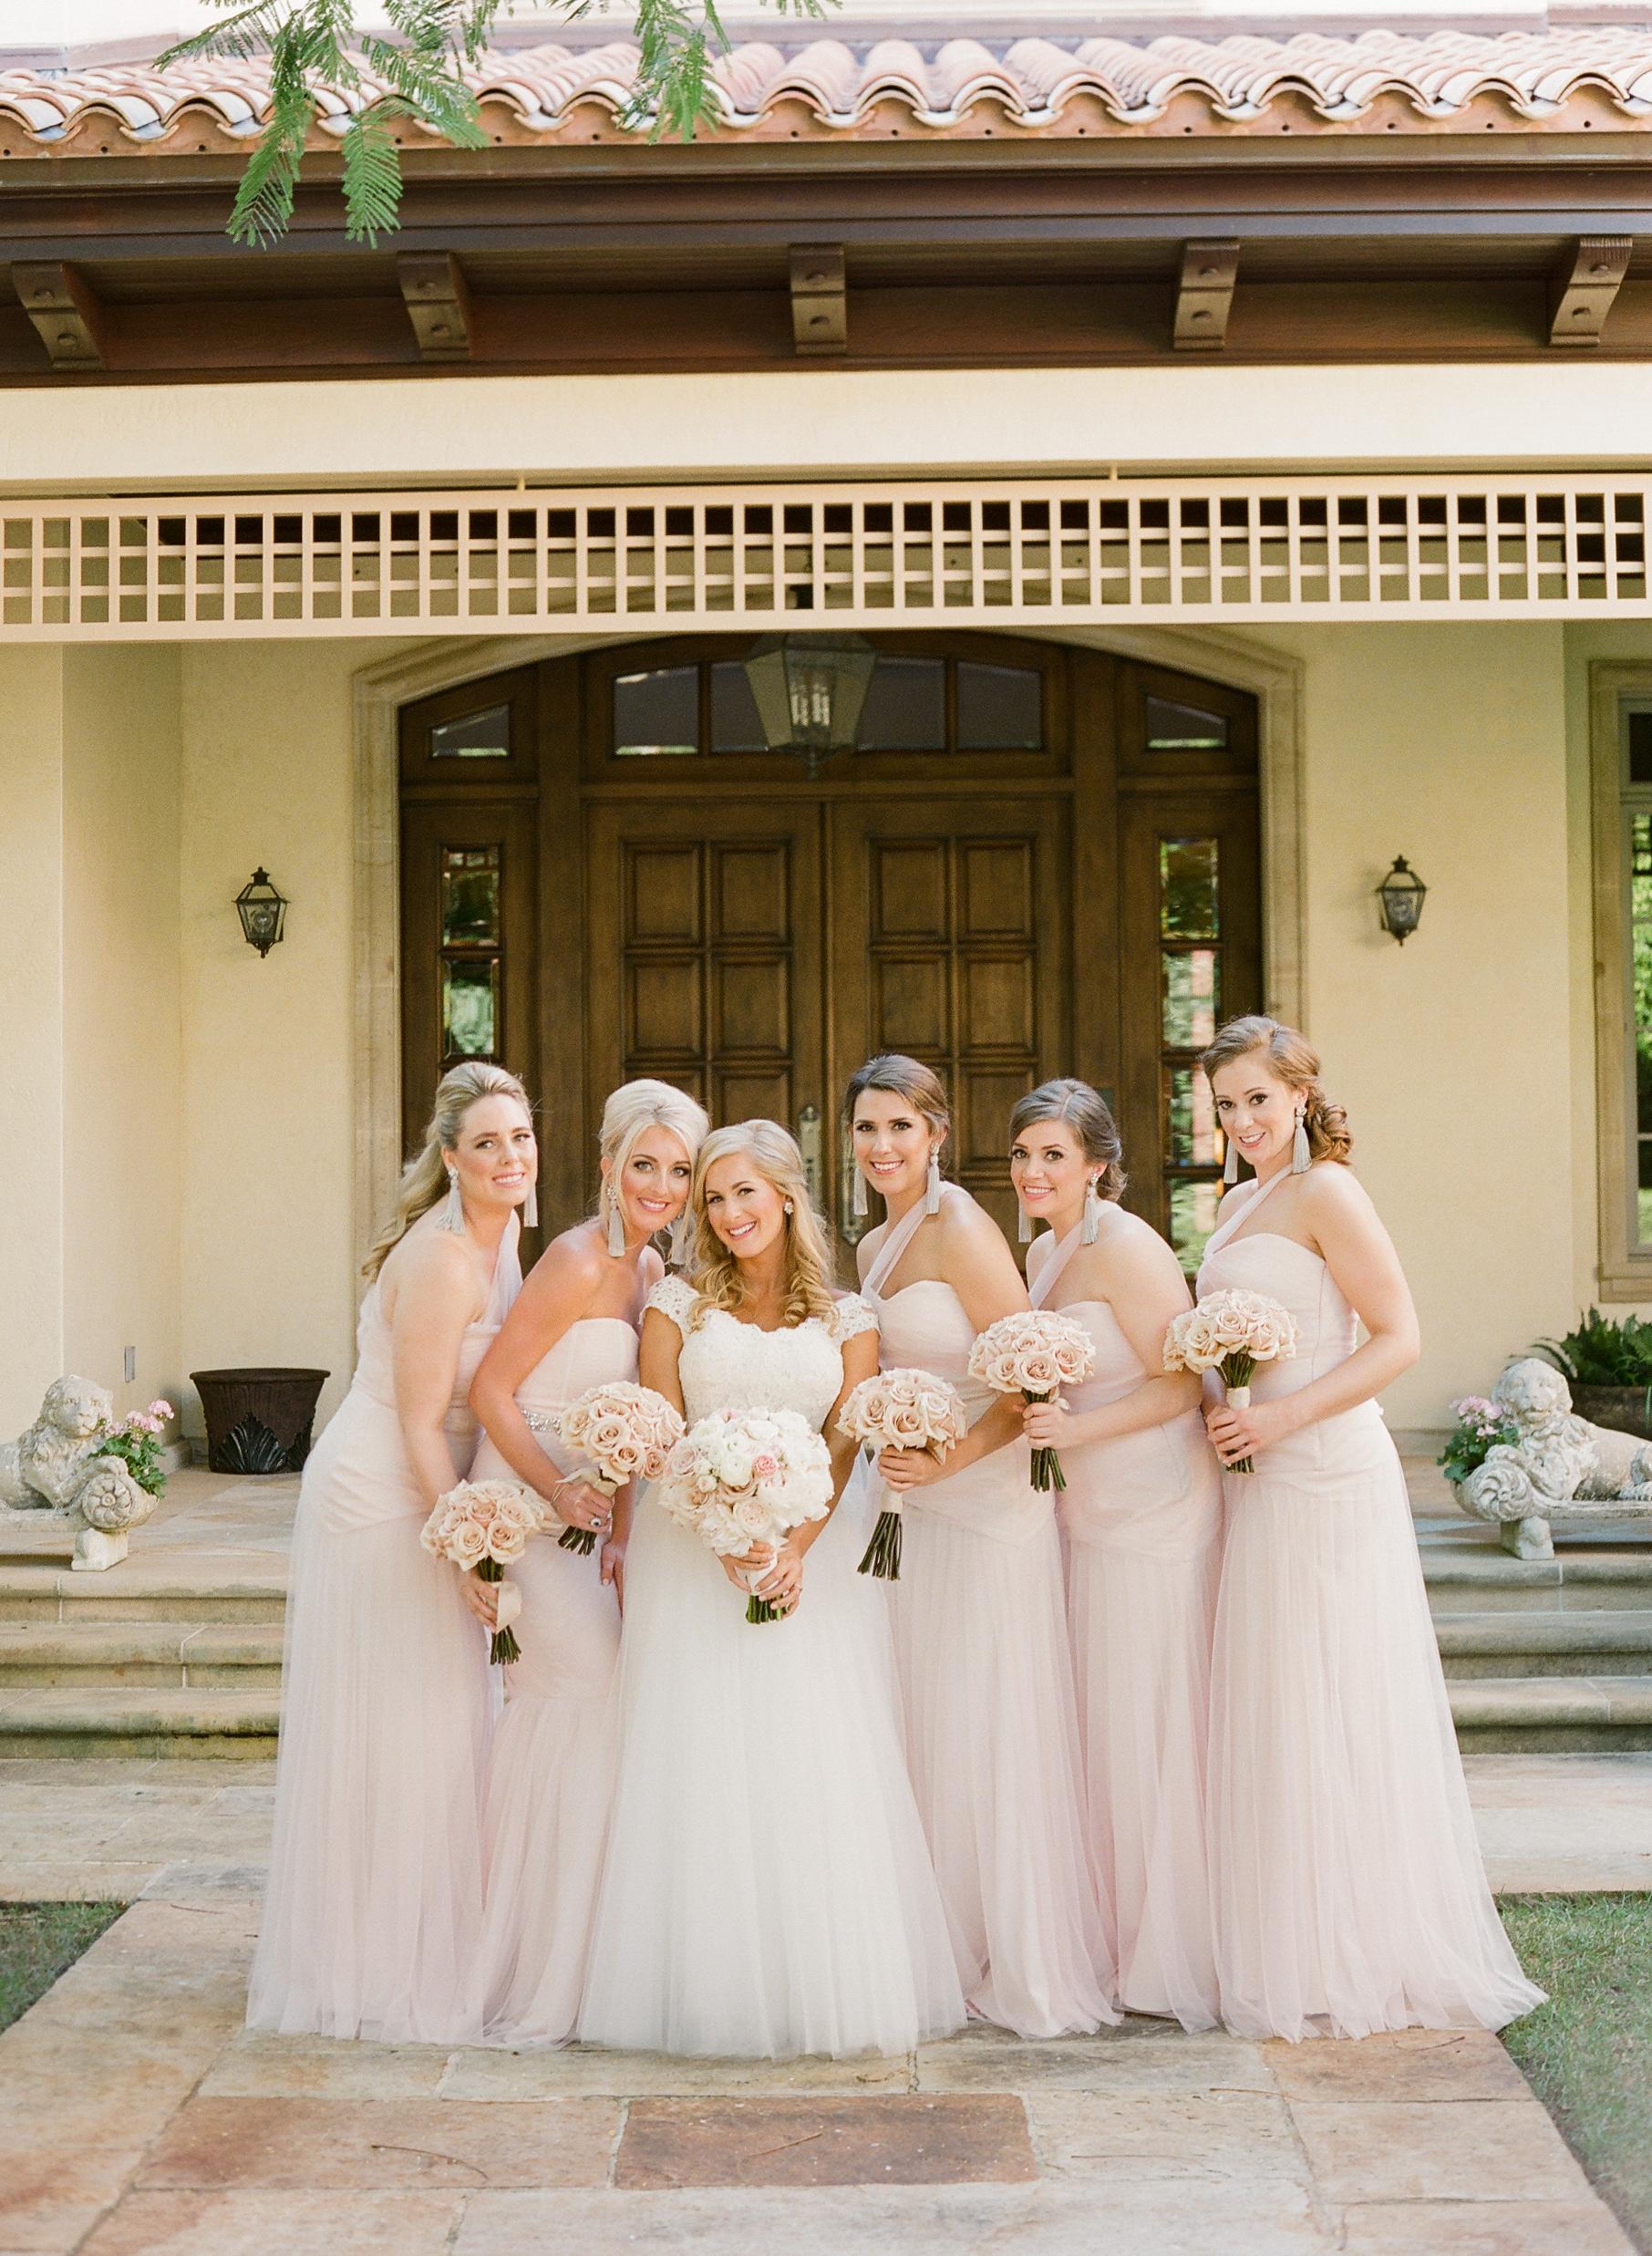 Ceci_New_York_Florida_Wedding_Style_Bride_Watercolor_Real_Custom_Luxury_44.jpg